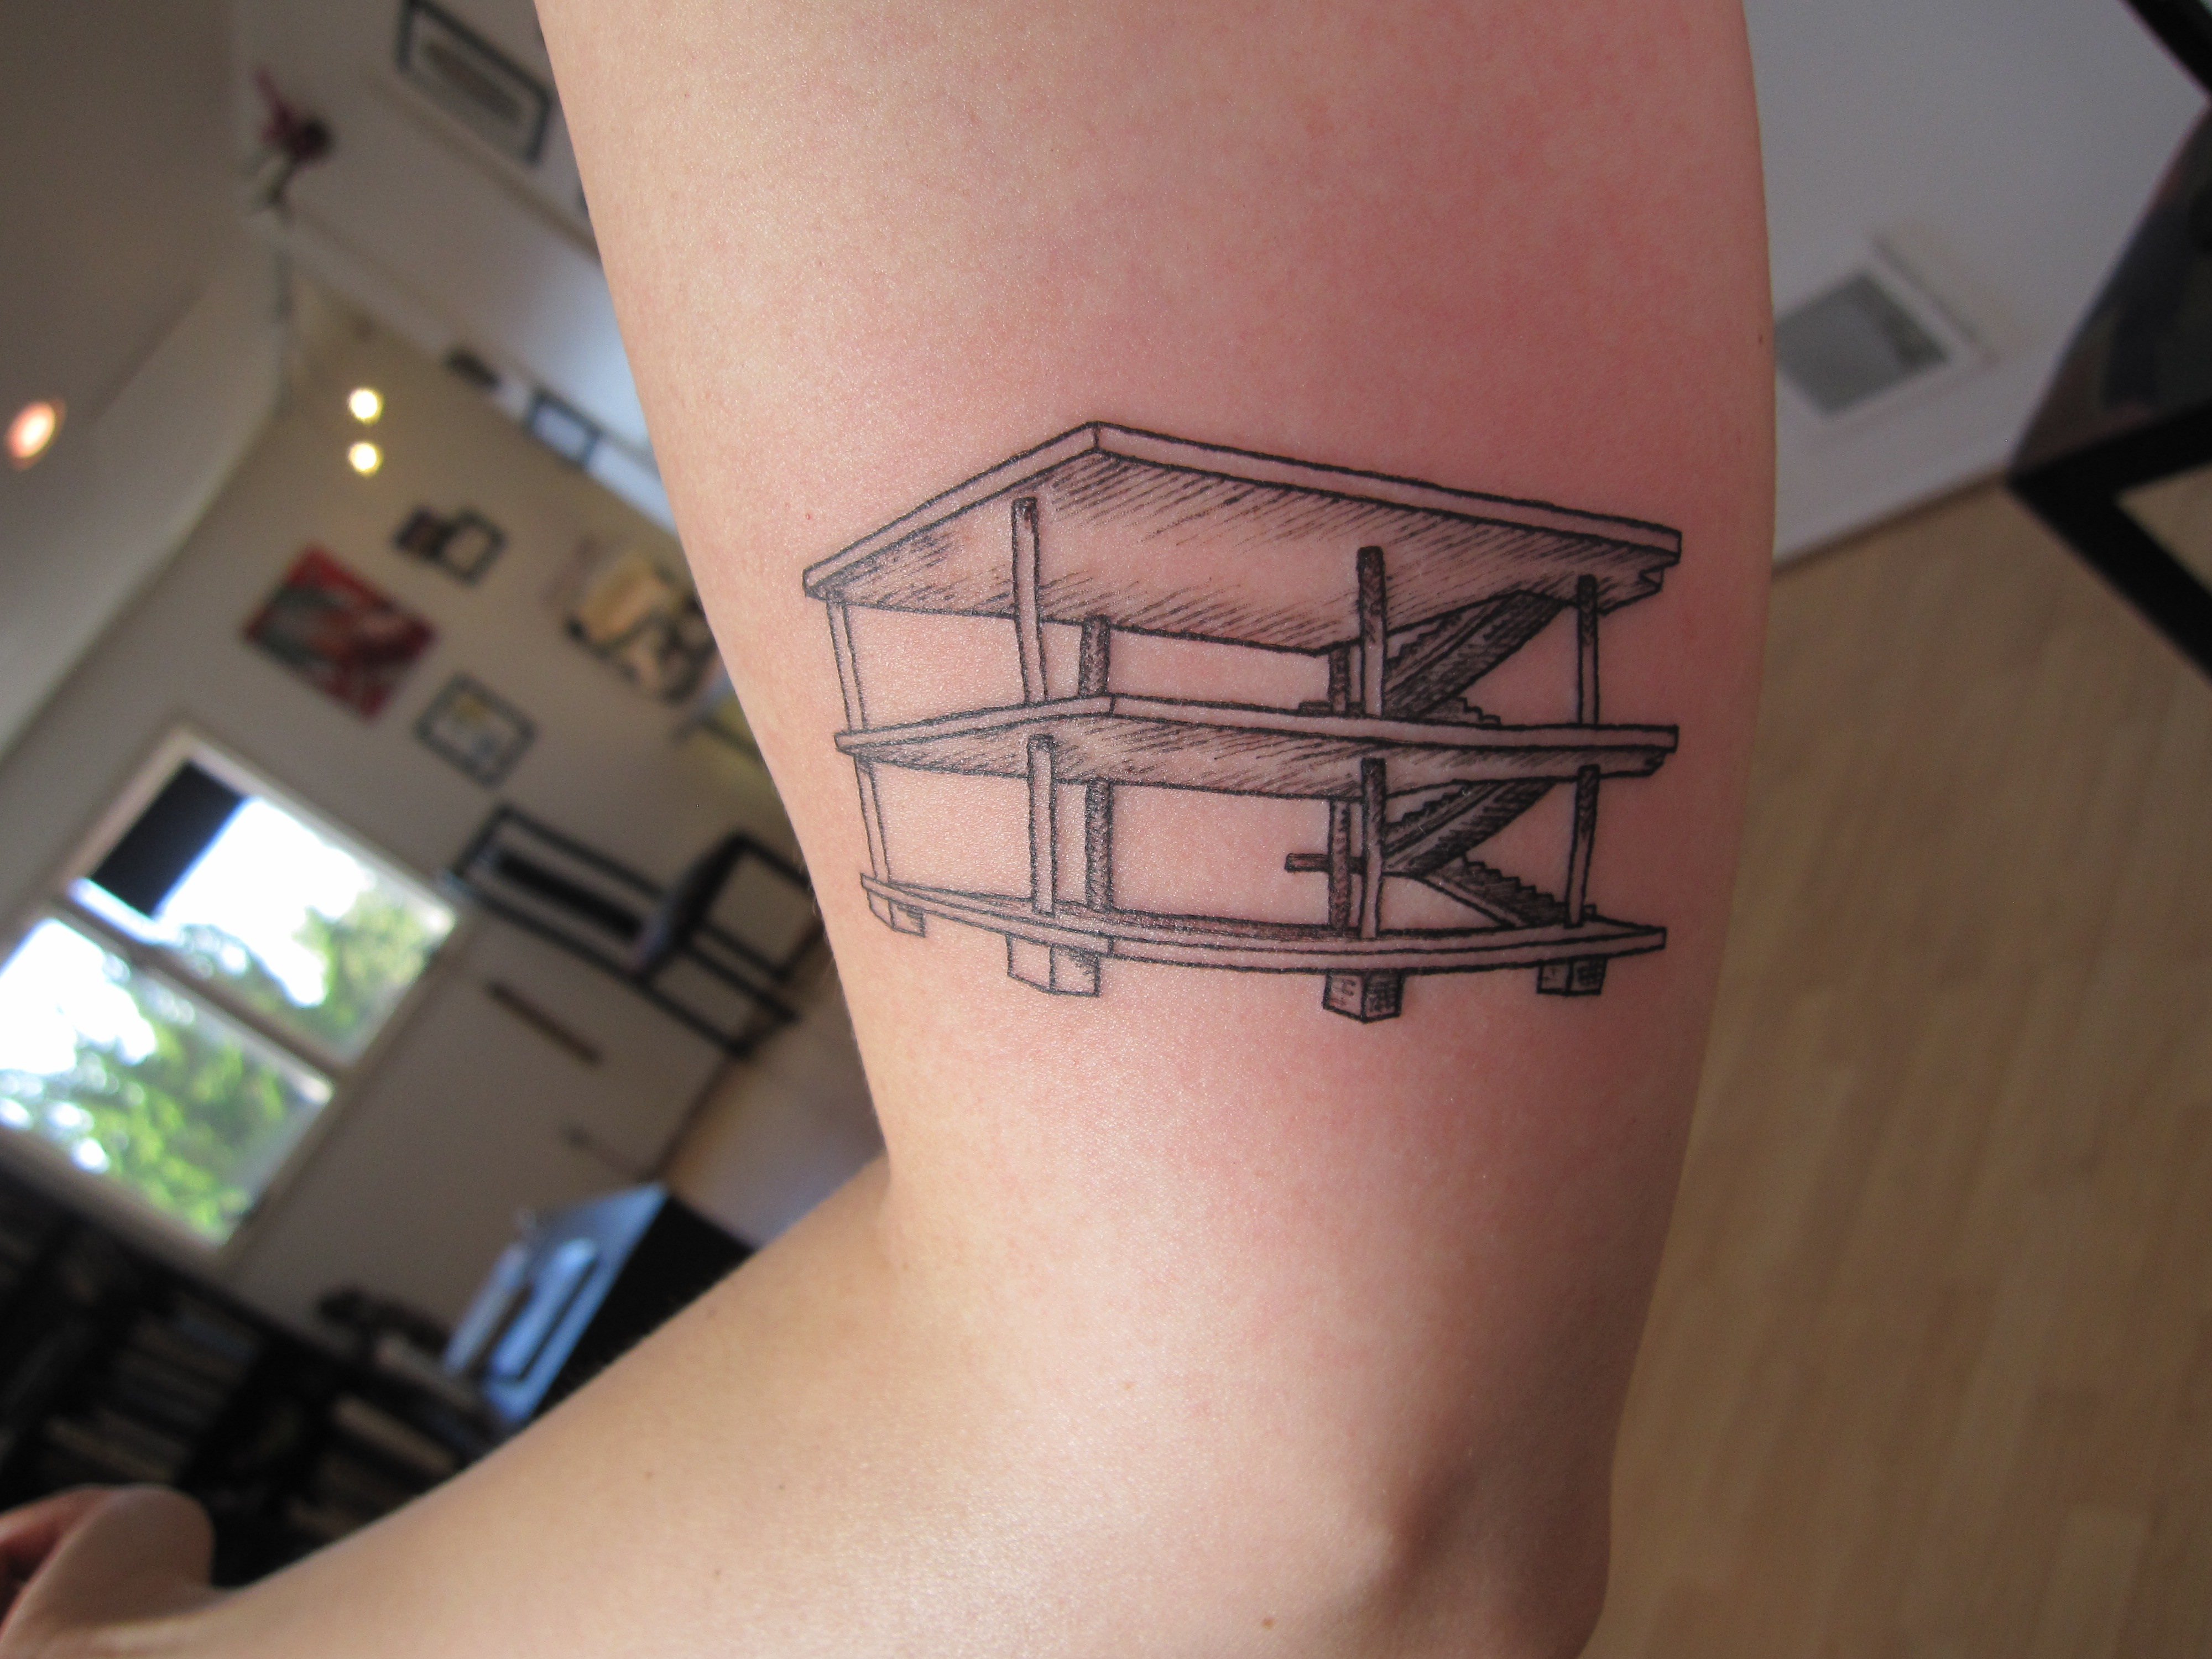 Maison domino suite c tattoo for Maison domino